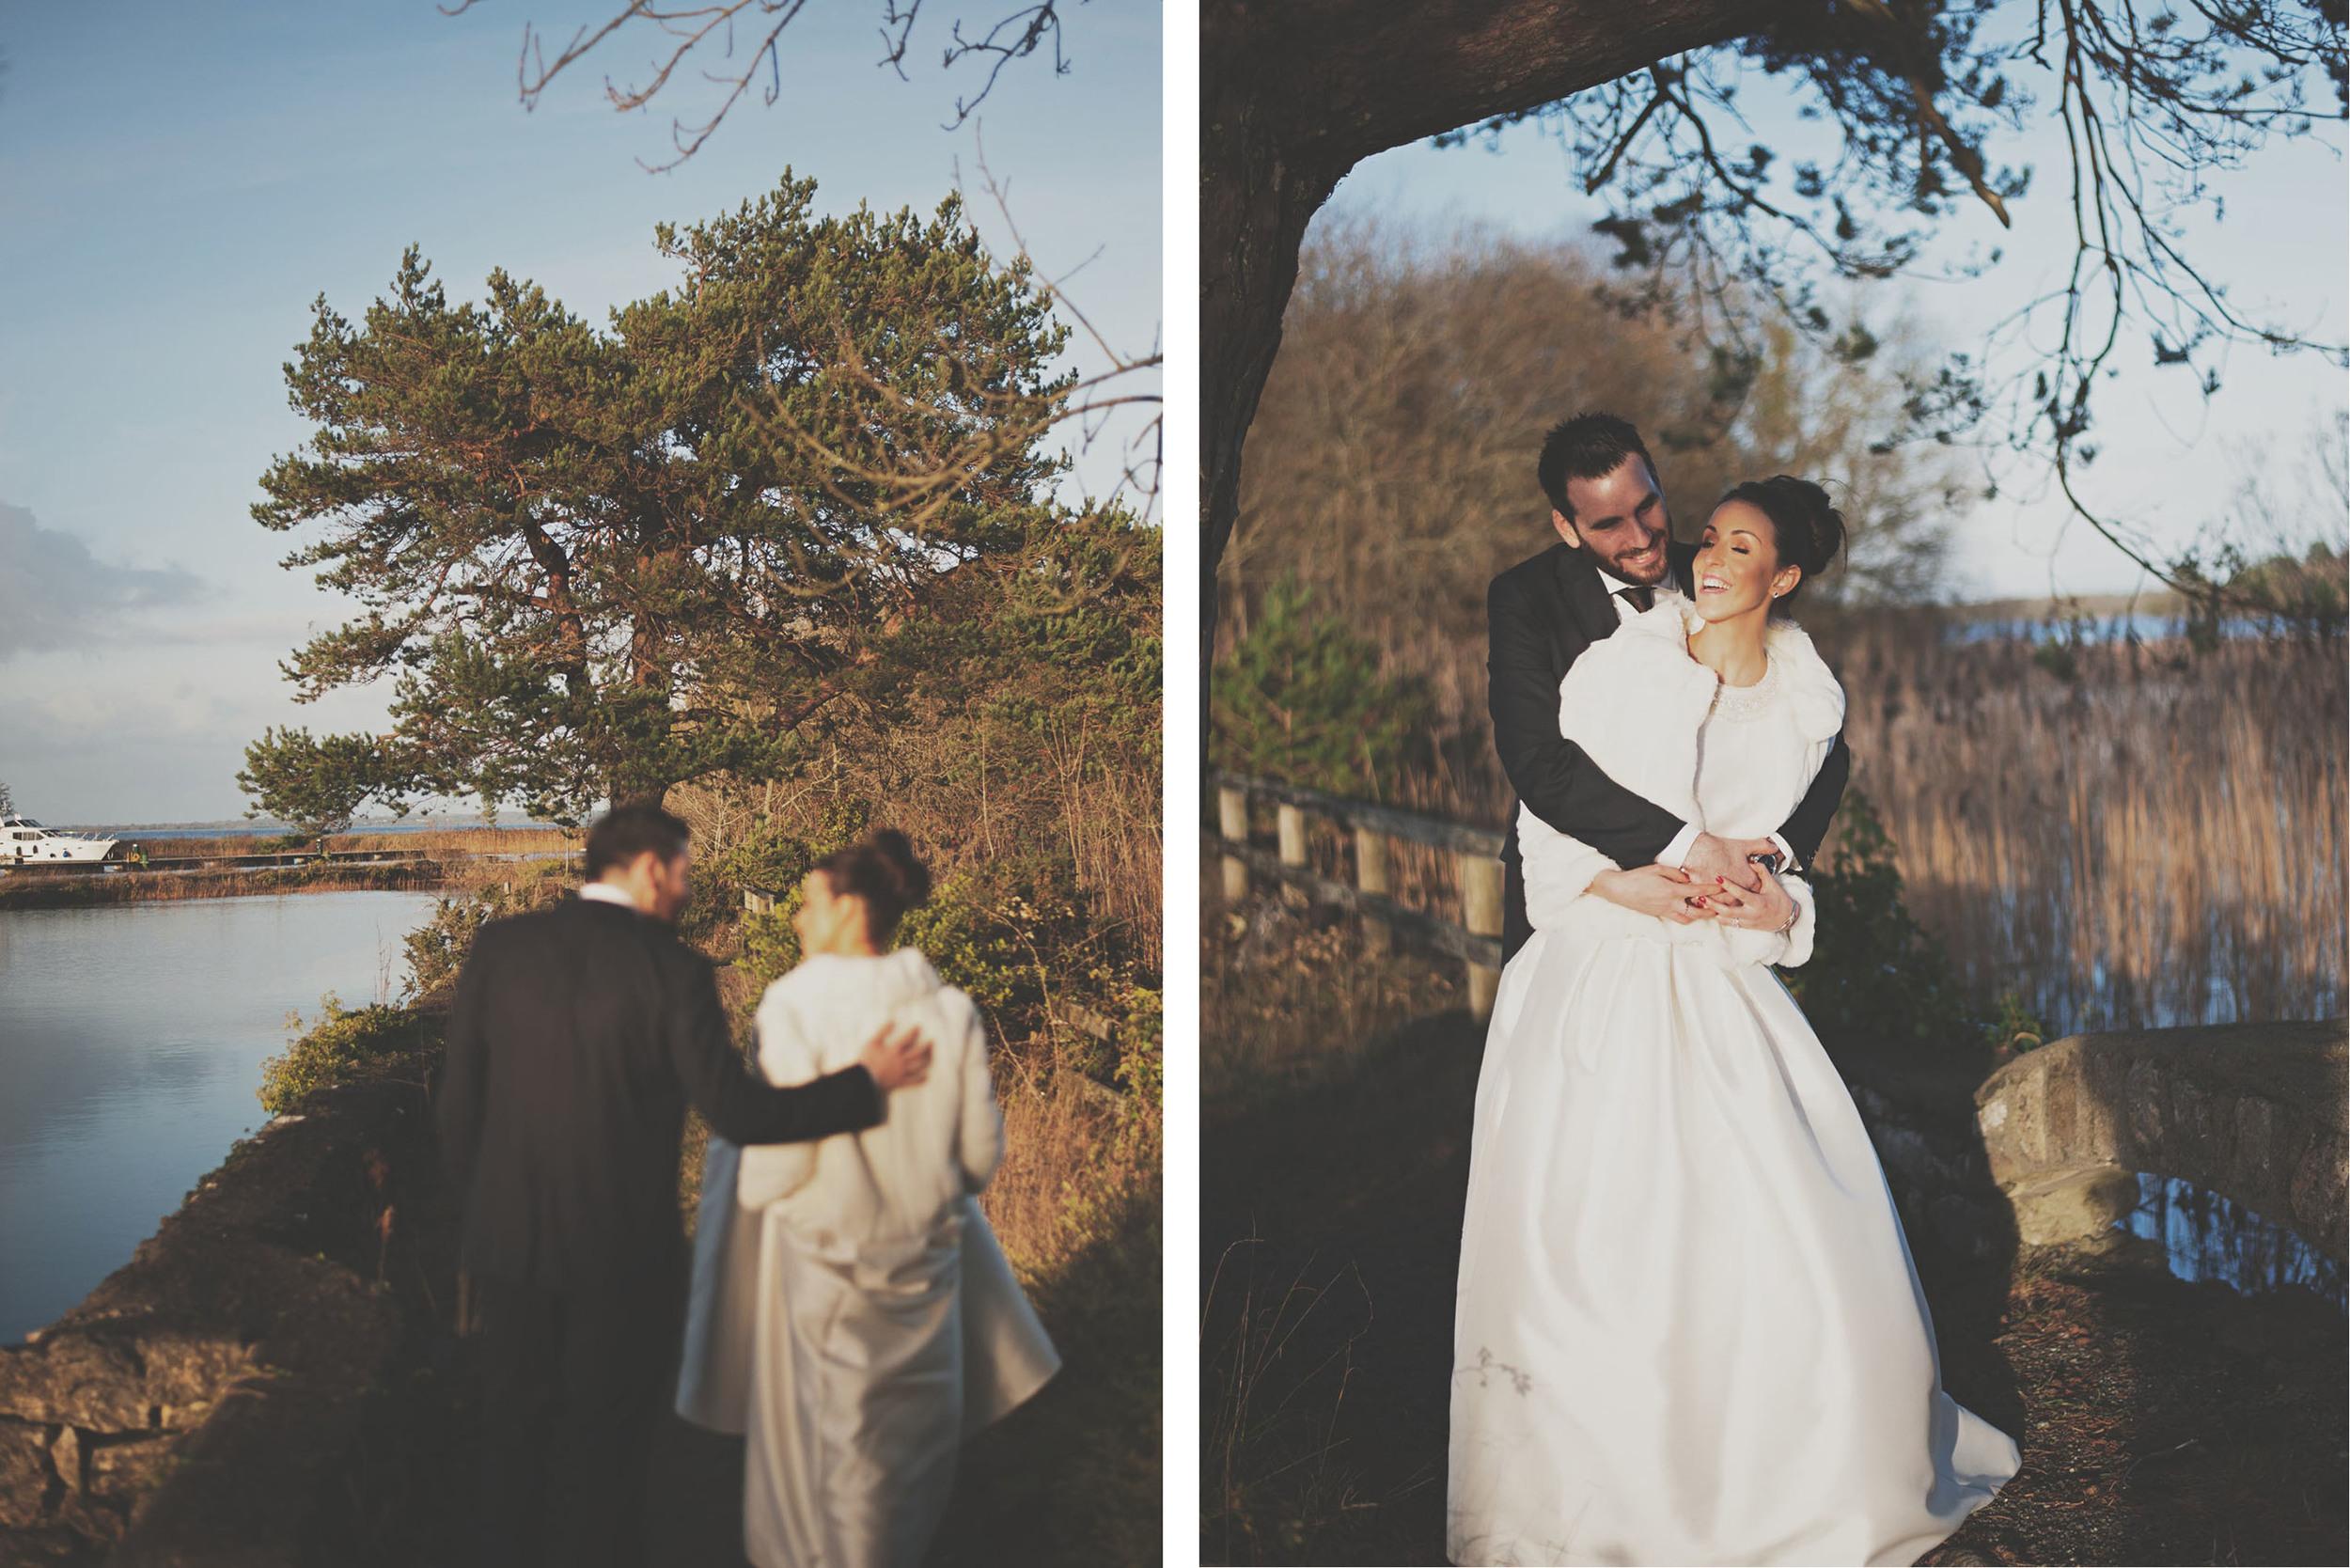 Tricia & Maurice's Coolbawn Quay Wedding 074.jpg